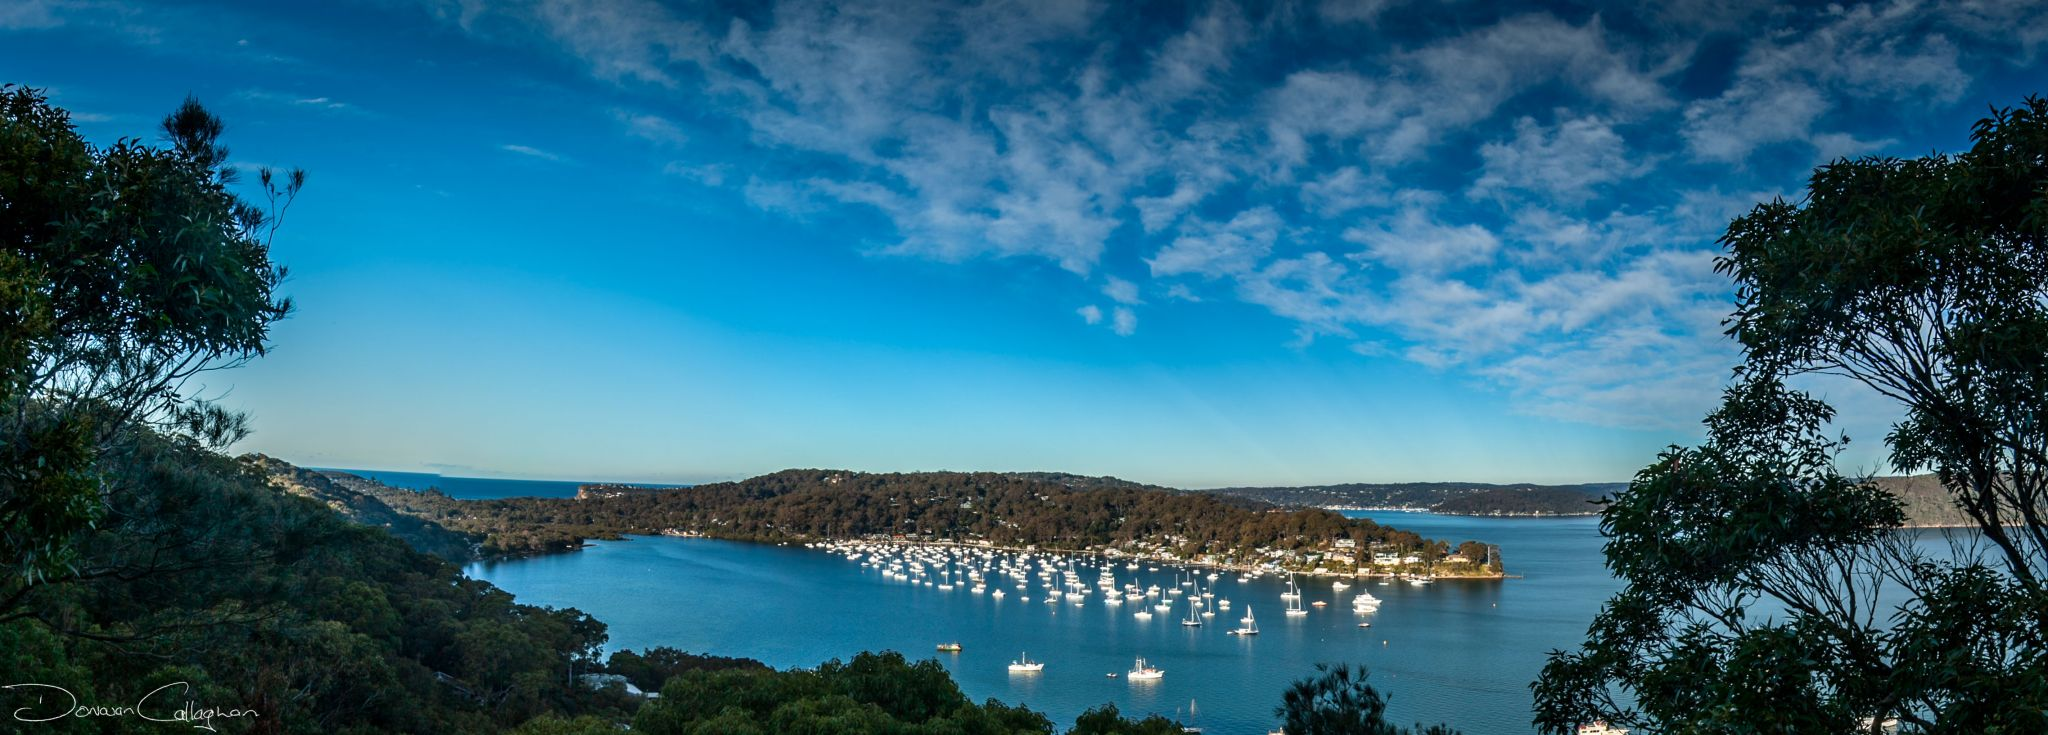 McKay reserve toward Careel Bay, Northern Beaches Sydney, Australia